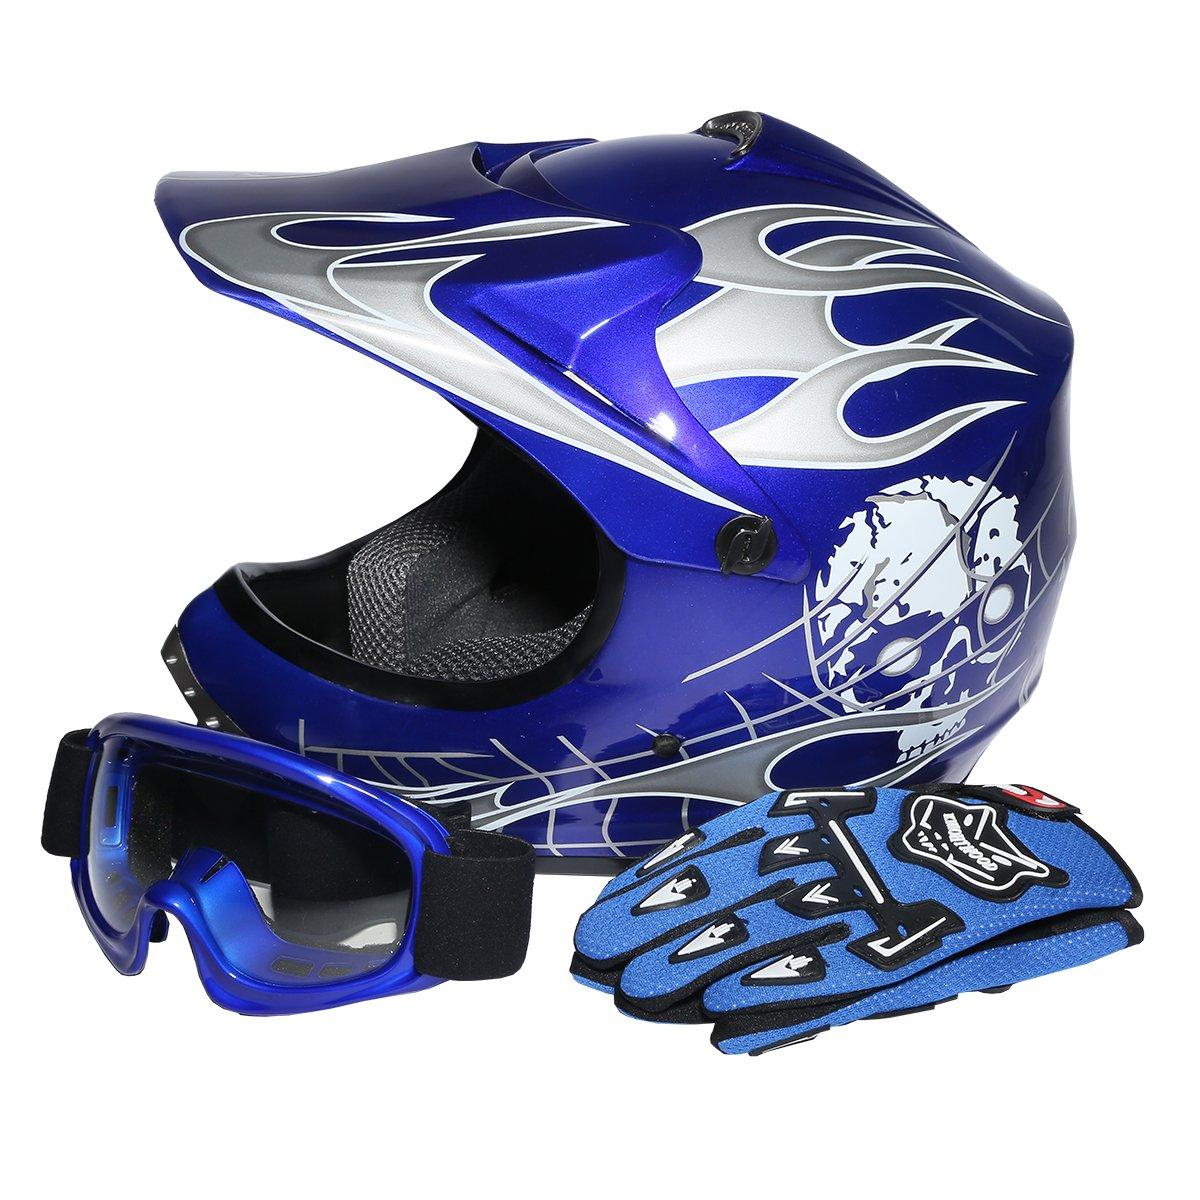 XFMT Youth Kids Motocross Offroad Street Dirt Bike Helmet Goggles Gloves Atv Mx Helmet Pink Butterfly (XL, Blue Skull)